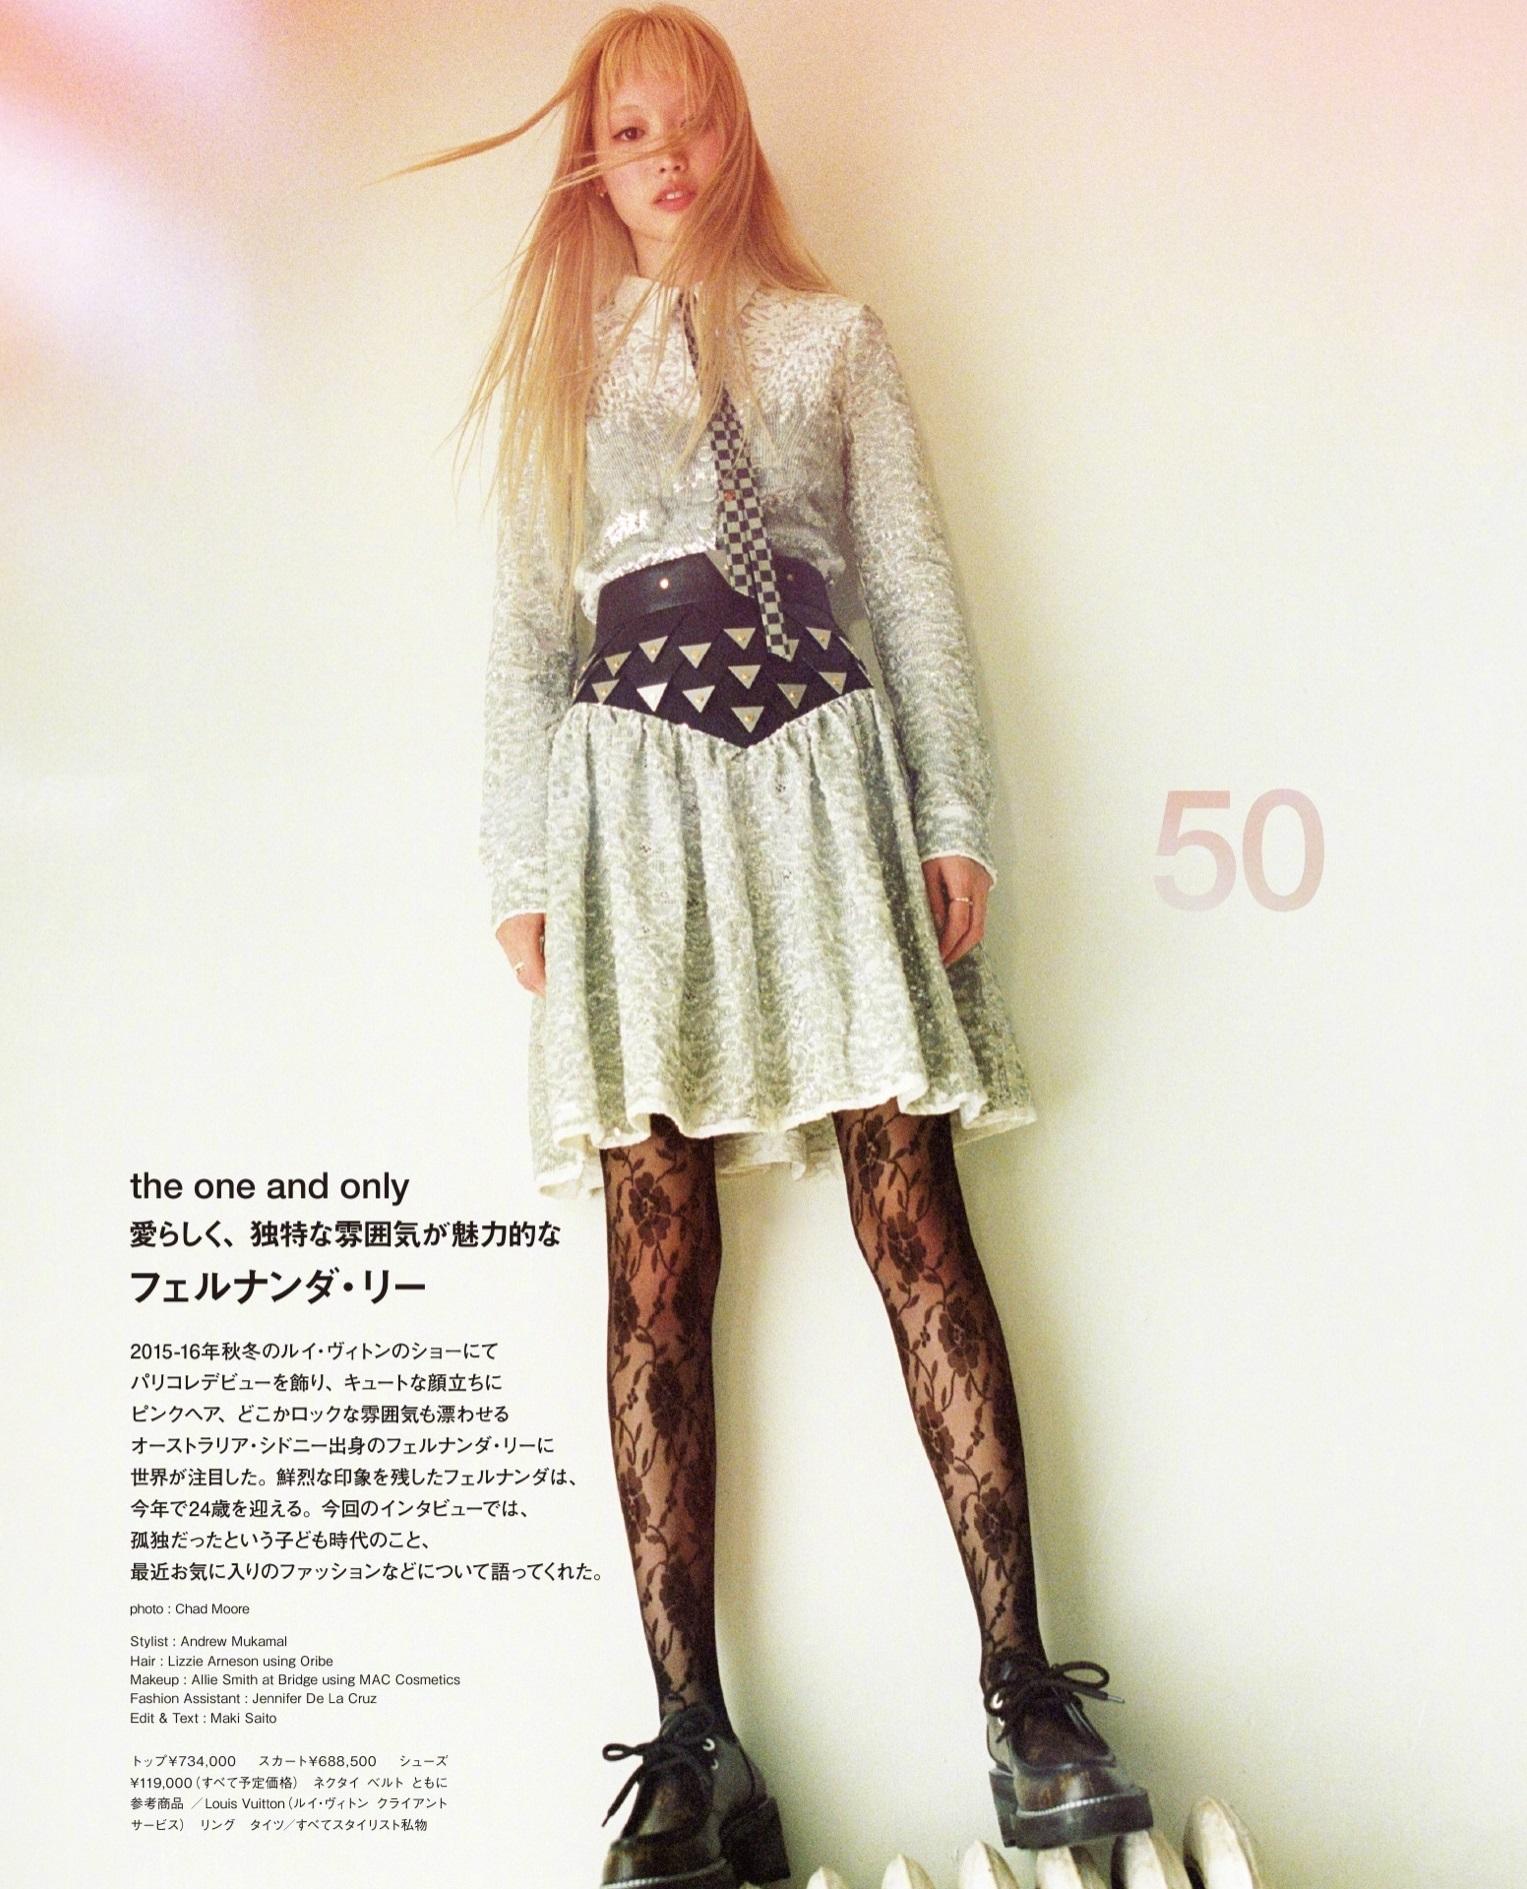 Fernanca Ly by Chad Moore for Numero Tokyo 129 (1).jpg